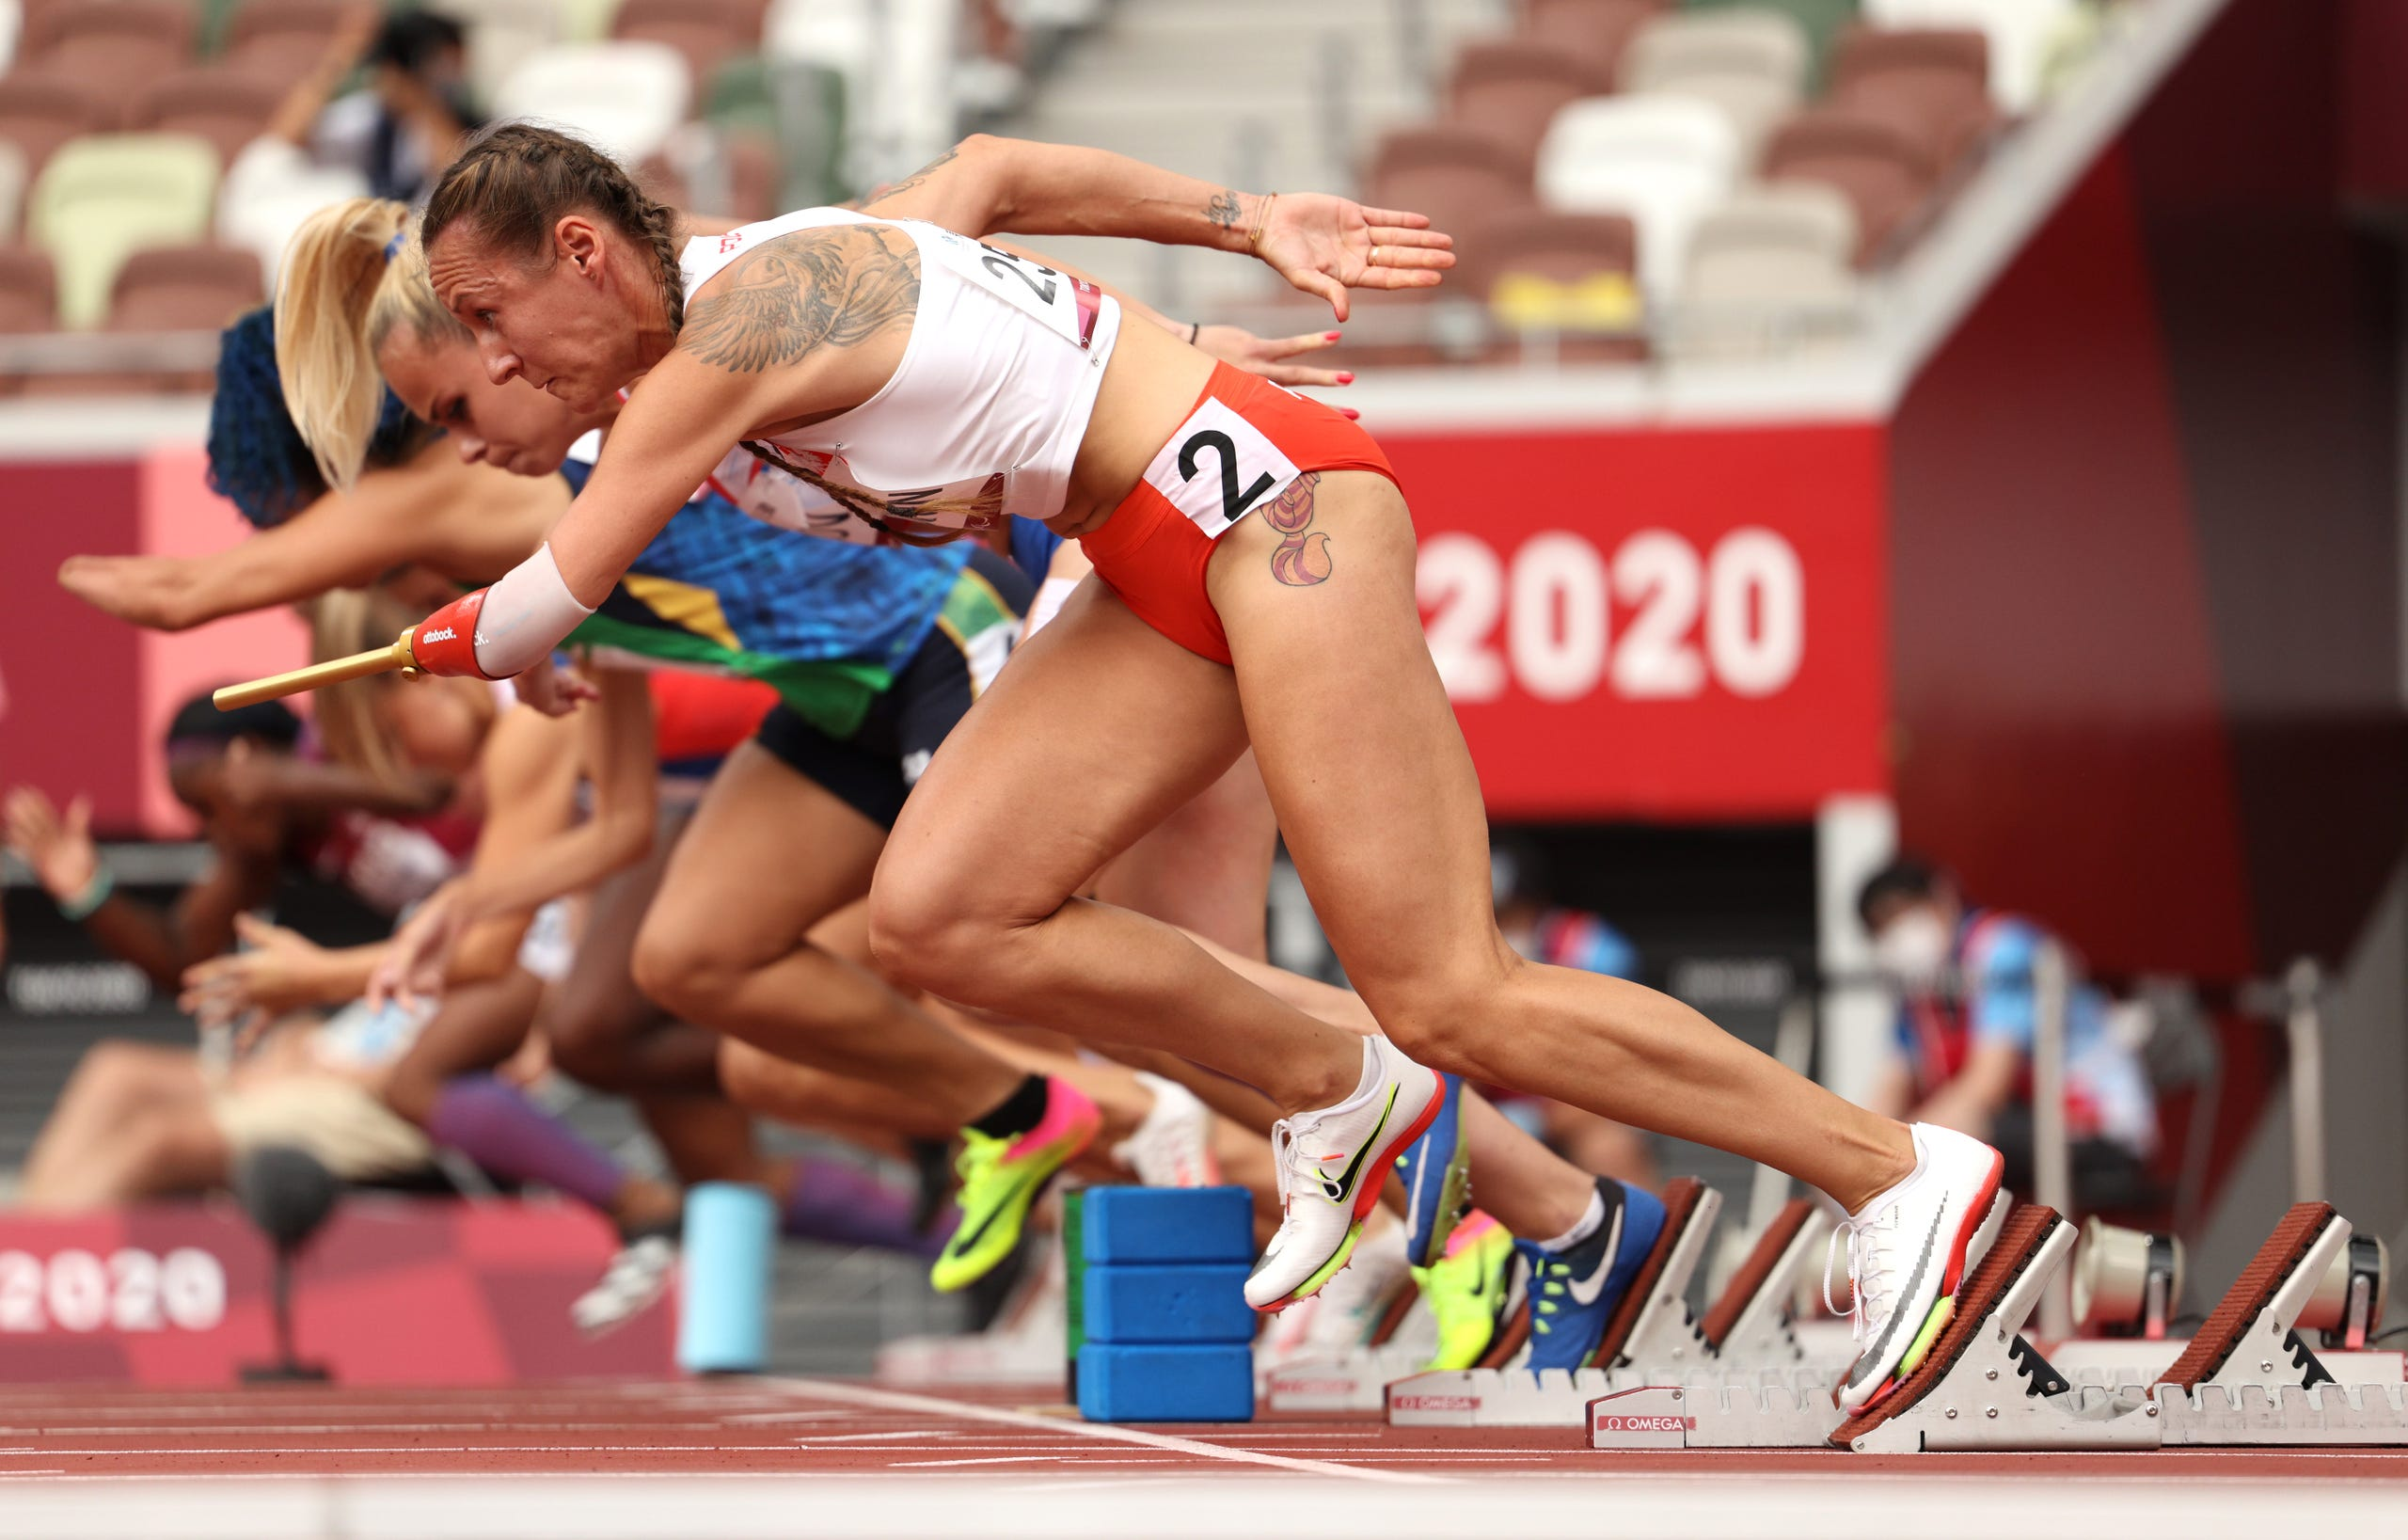 Aug. 31, 2021: Alicja Jeromin of Team Poland starts  during Heat 2 of the women's 100-meter dash.